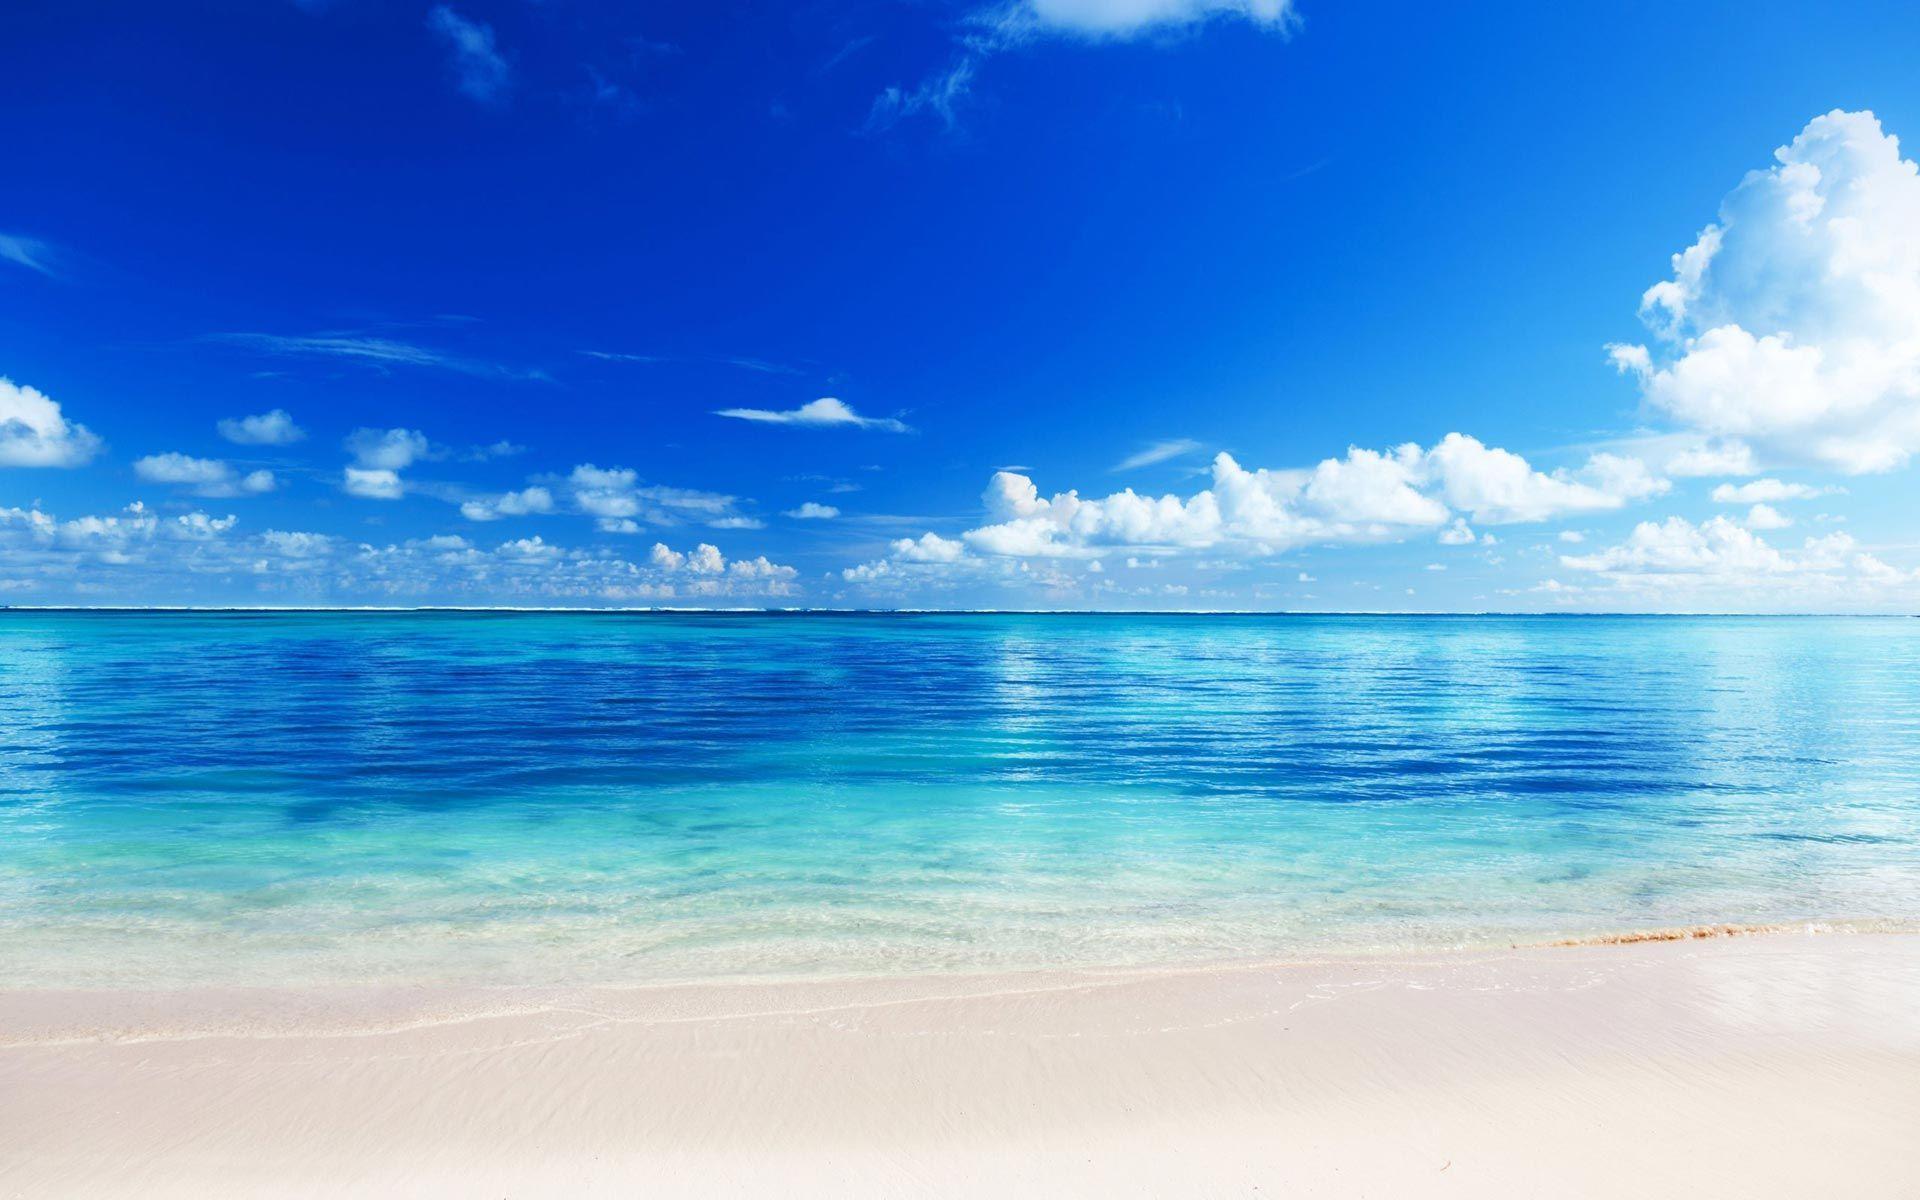 Clear Water 4 Hd Wallpaper Wallpaper Place Beach Background Beach Landscape Ocean Landscape